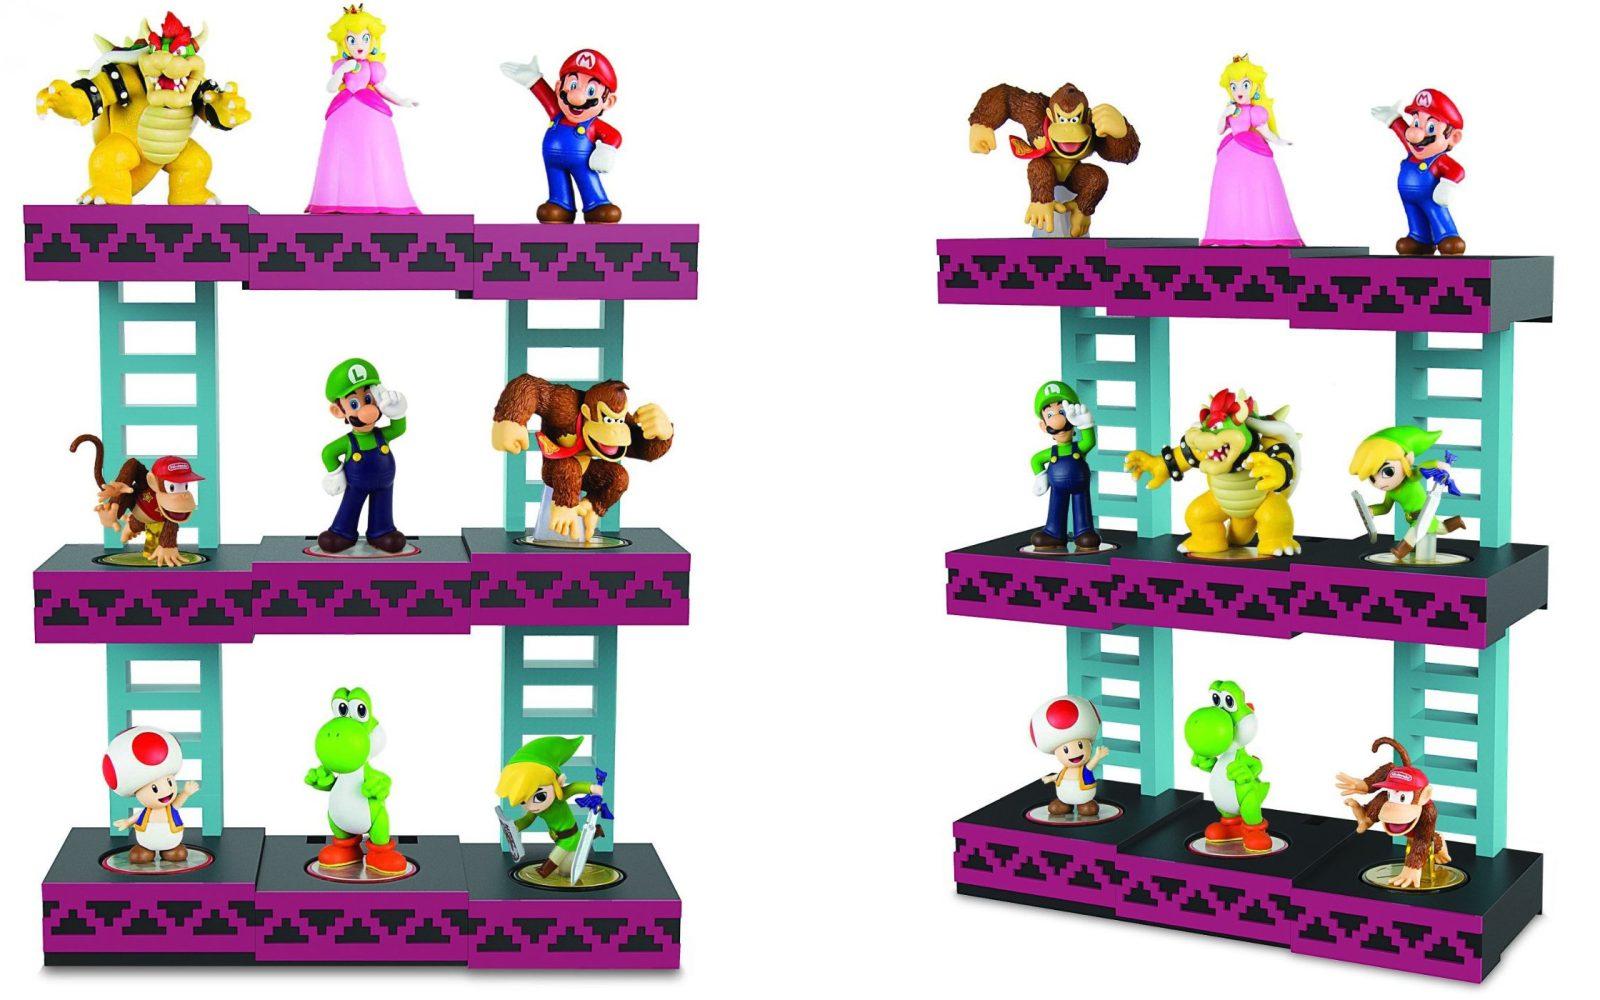 These new Donkey Kong, Zelda and 8-bit Mario Bros-themed amiibo